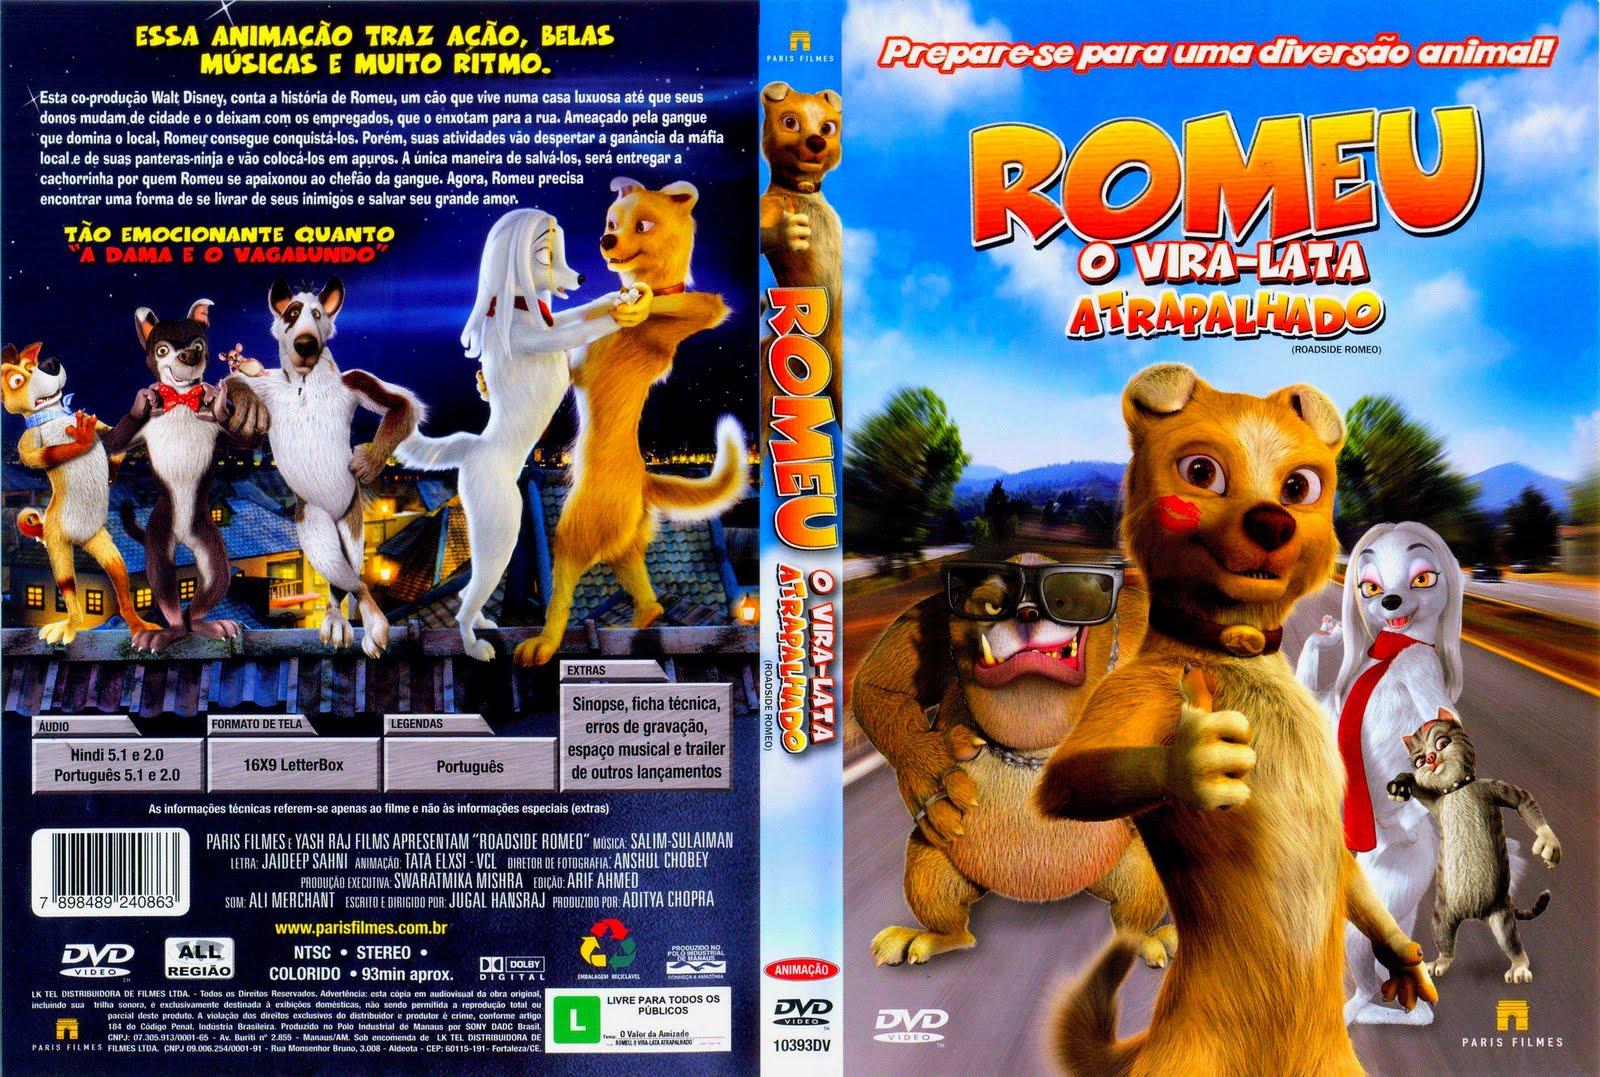 http://2.bp.blogspot.com/_khHh6MVYPgc/TFG7zBBqjyI/AAAAAAAAFR4/vMZn7cQ9YQA/s1600/Romeu+-+O+Vira+Lata+Atrapalhado.jpg